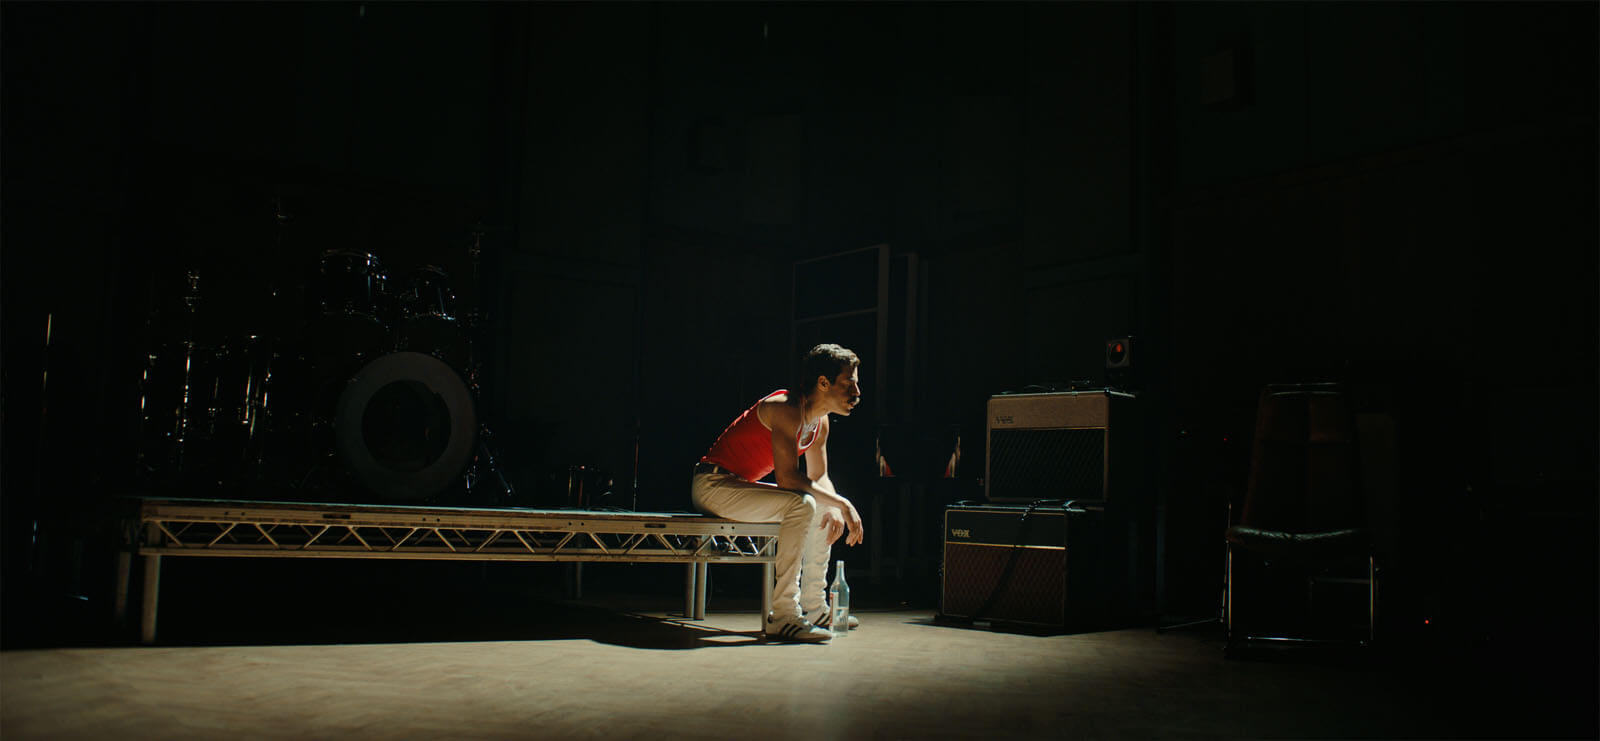 Bohemian Rhapsody, Bohemian Rhapsody filme, Queen, Delfos, Rami Malek